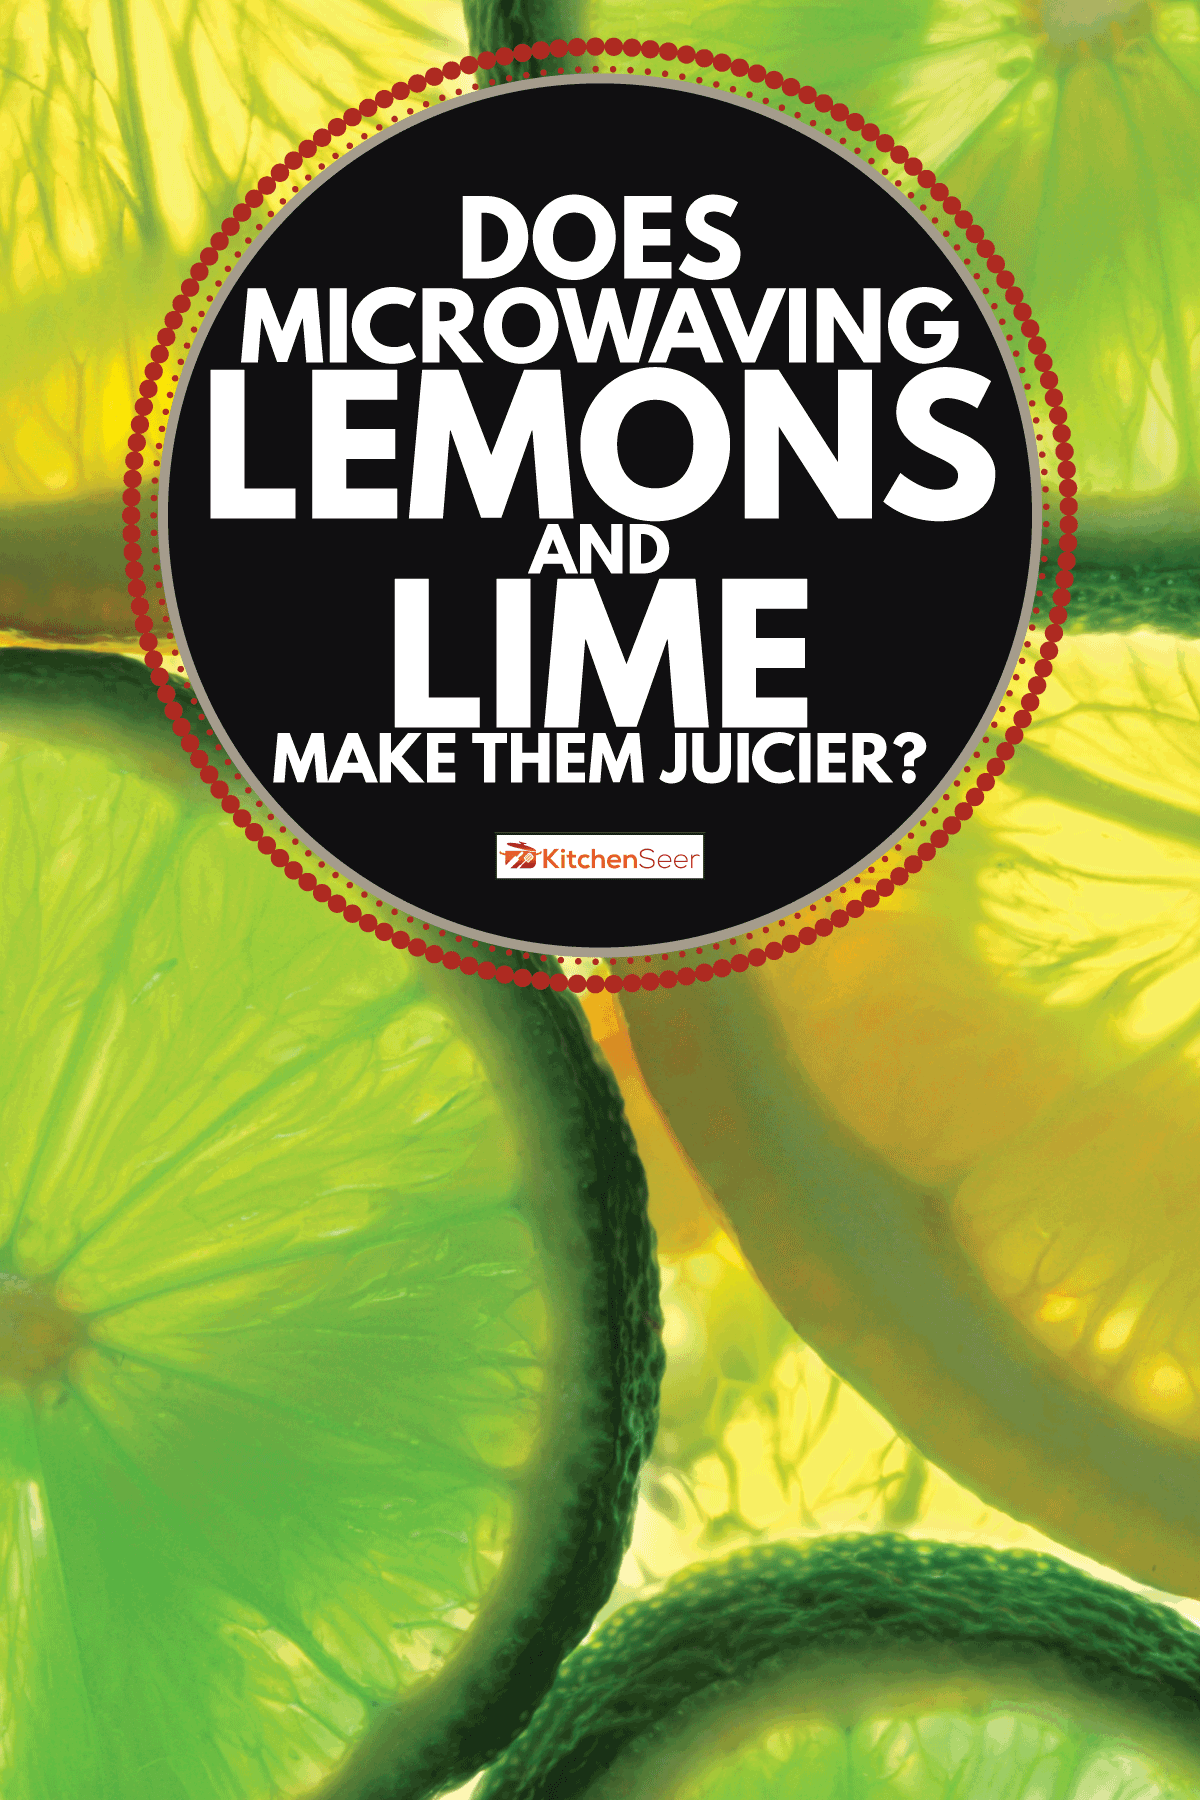 Lemon and green lime overlapped slice. Does Microwaving Lemons And Lime Make Them Juicier